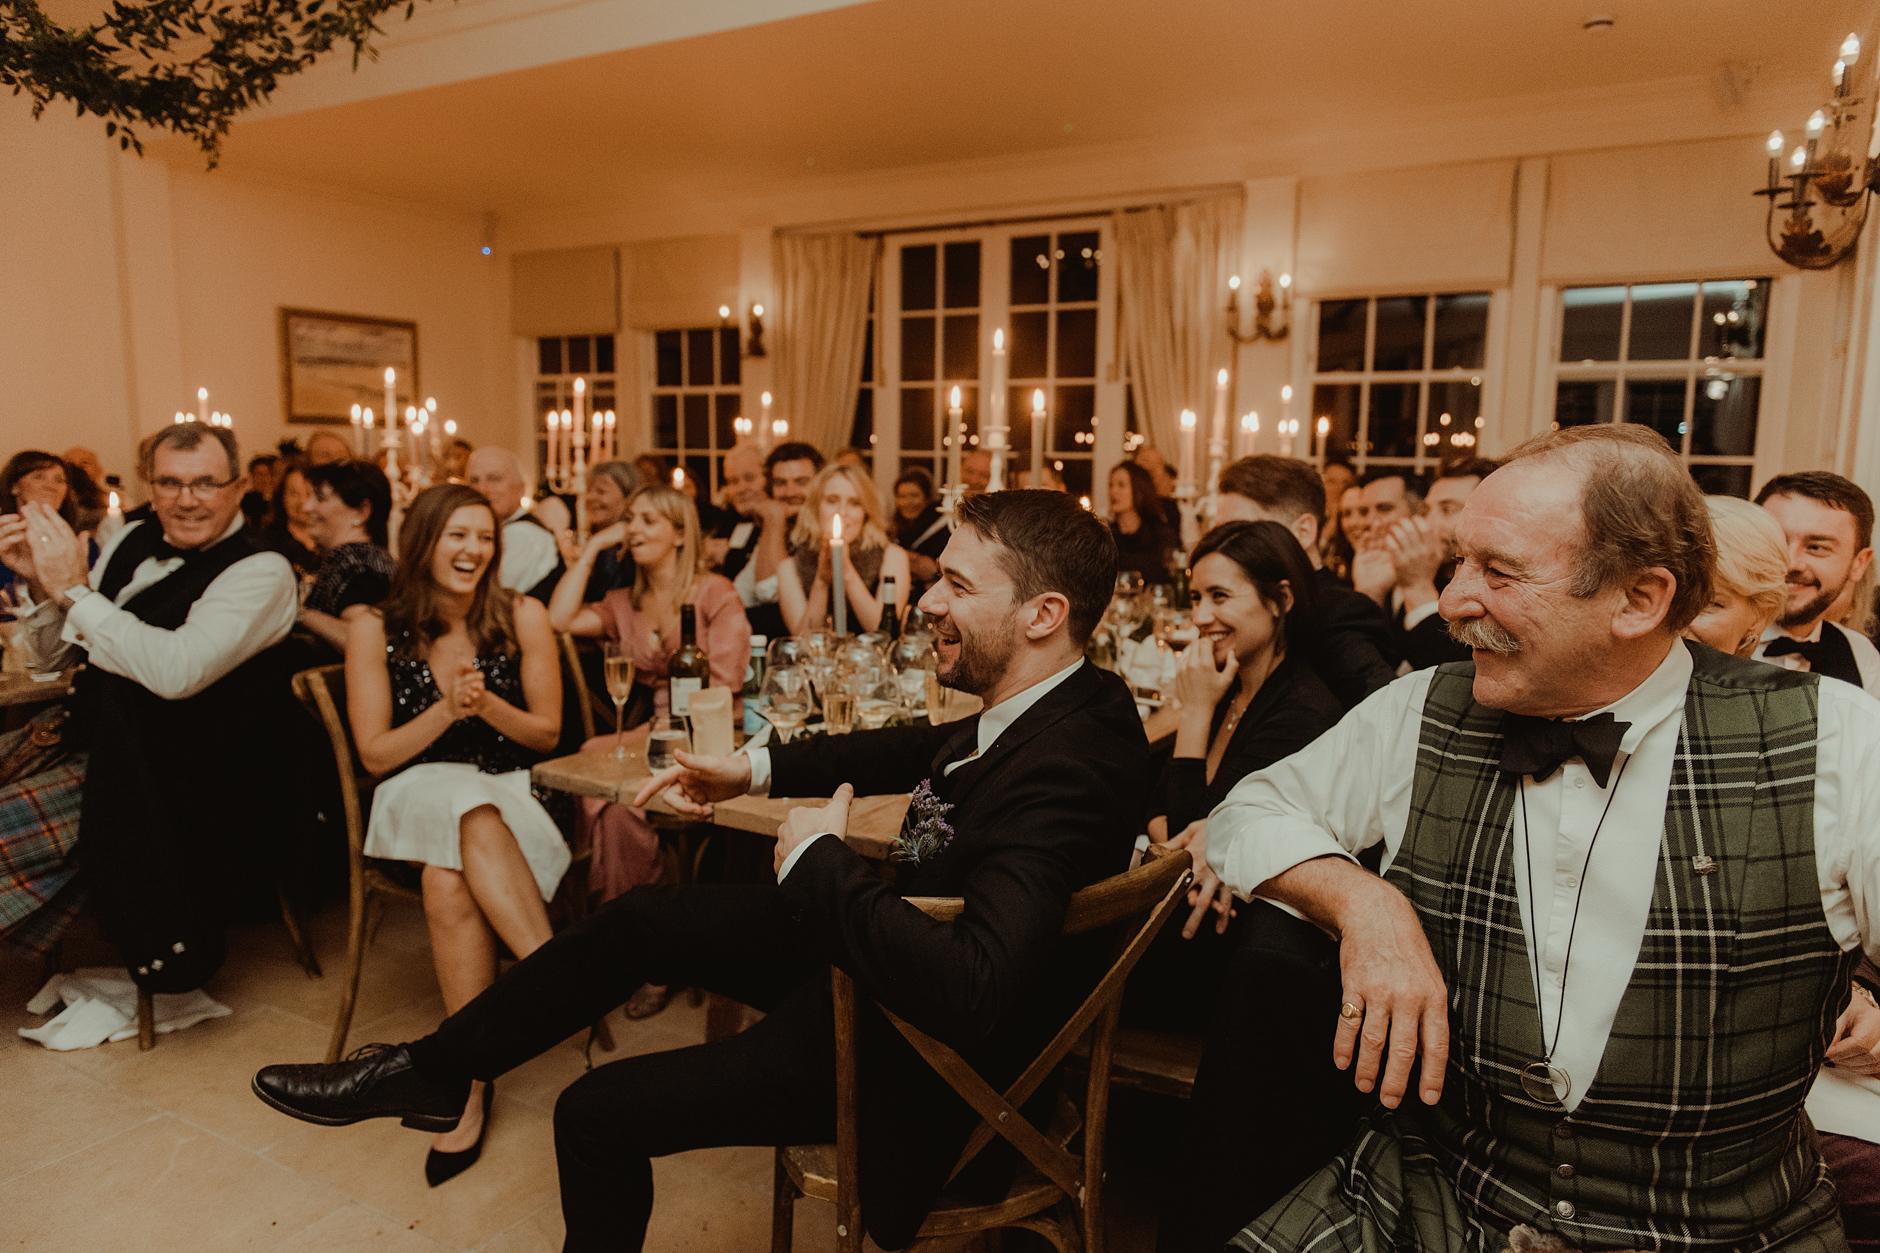 Glentruim-Wedding-Nikki-Leadbetter-Photography-274.jpg